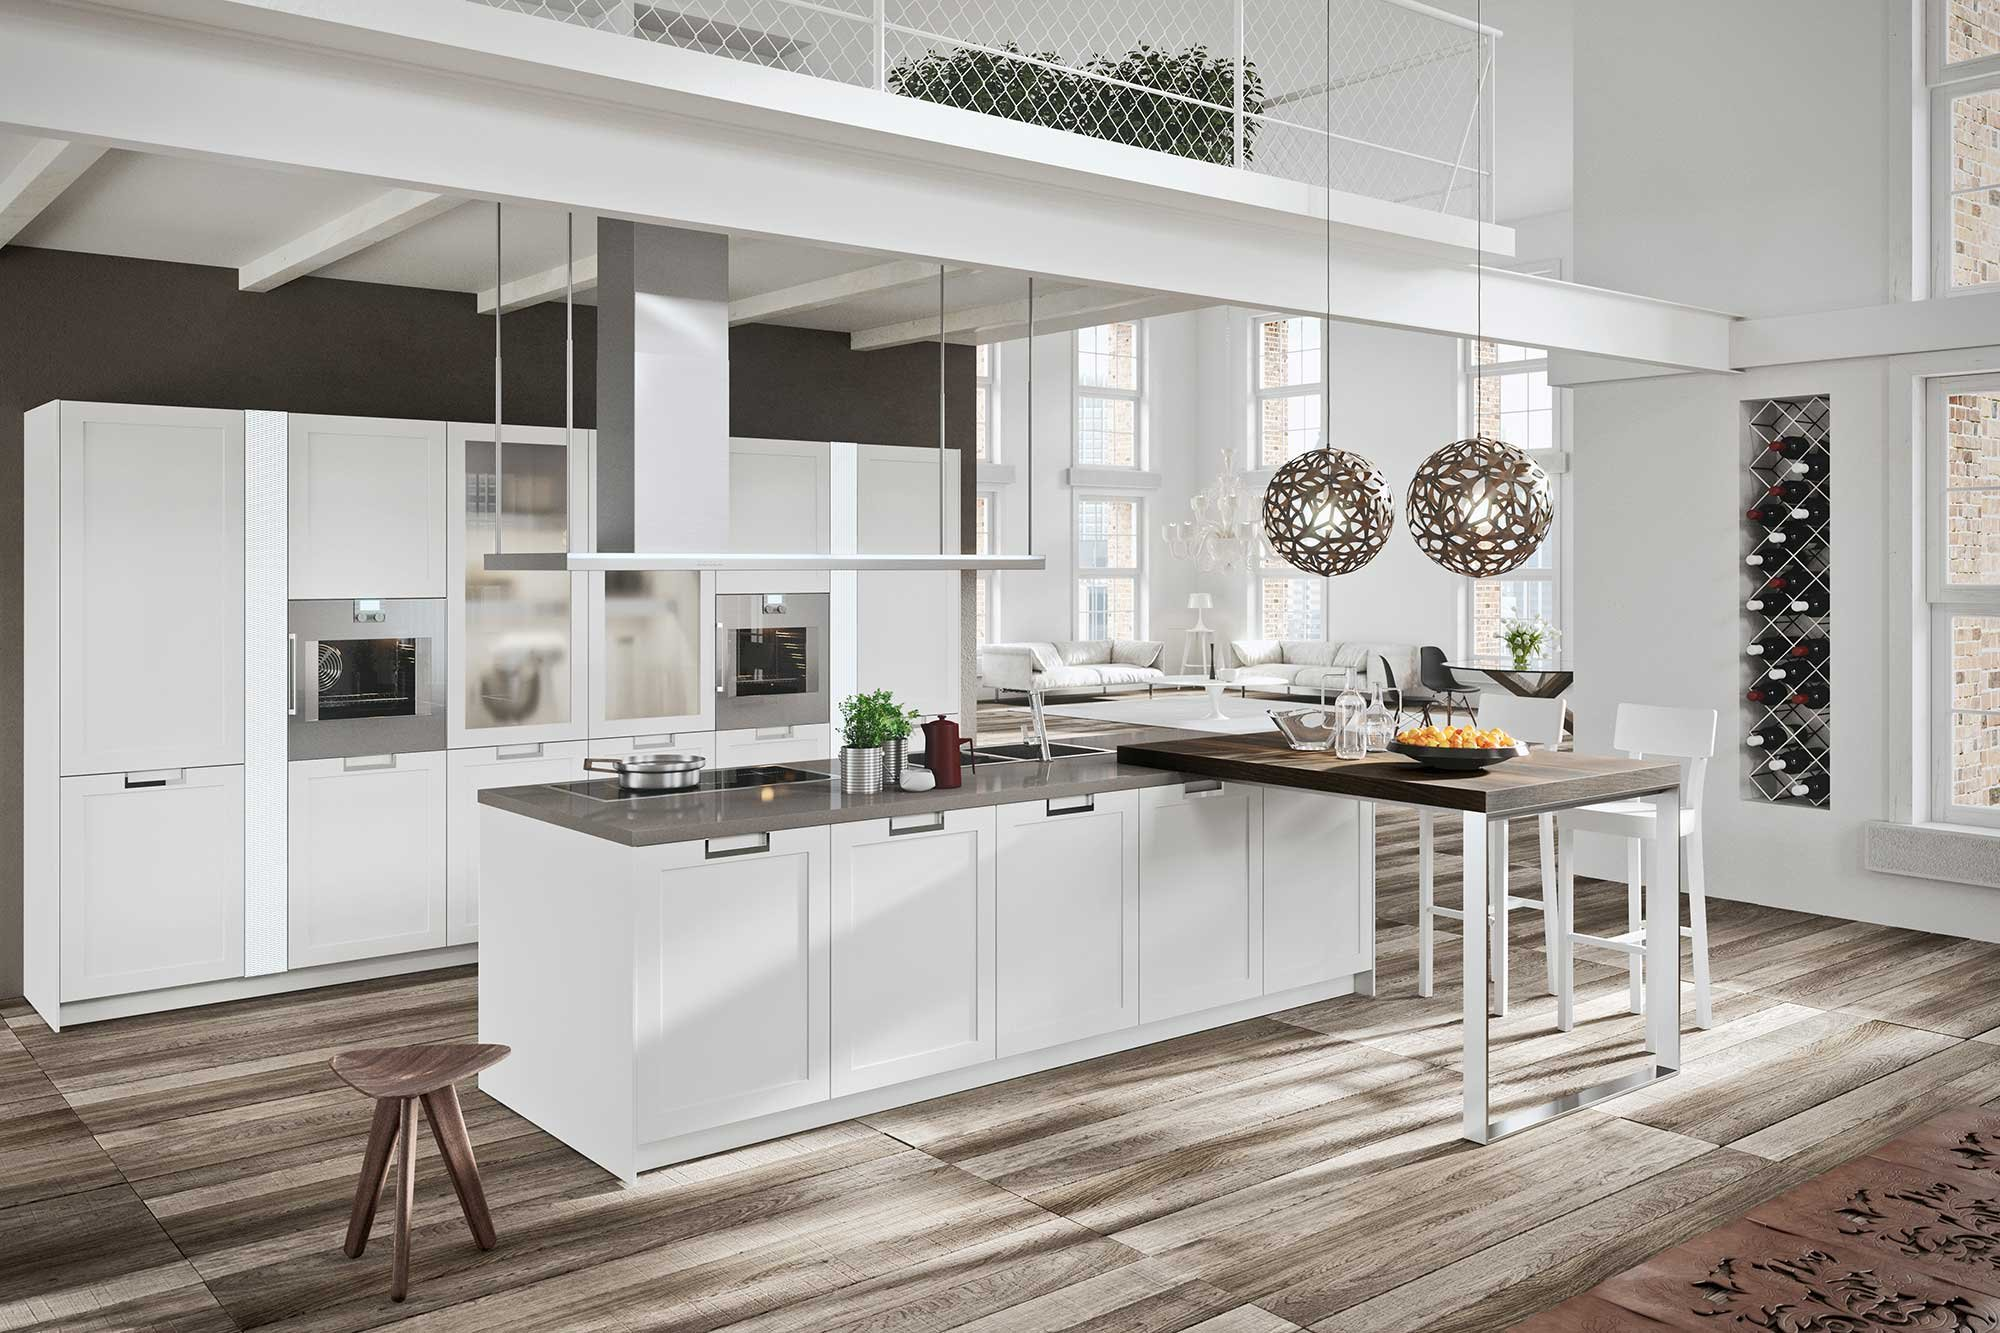 Cucina classica in bianco tre modi di essere total white cose di casa - Cucina laccato bianco ...